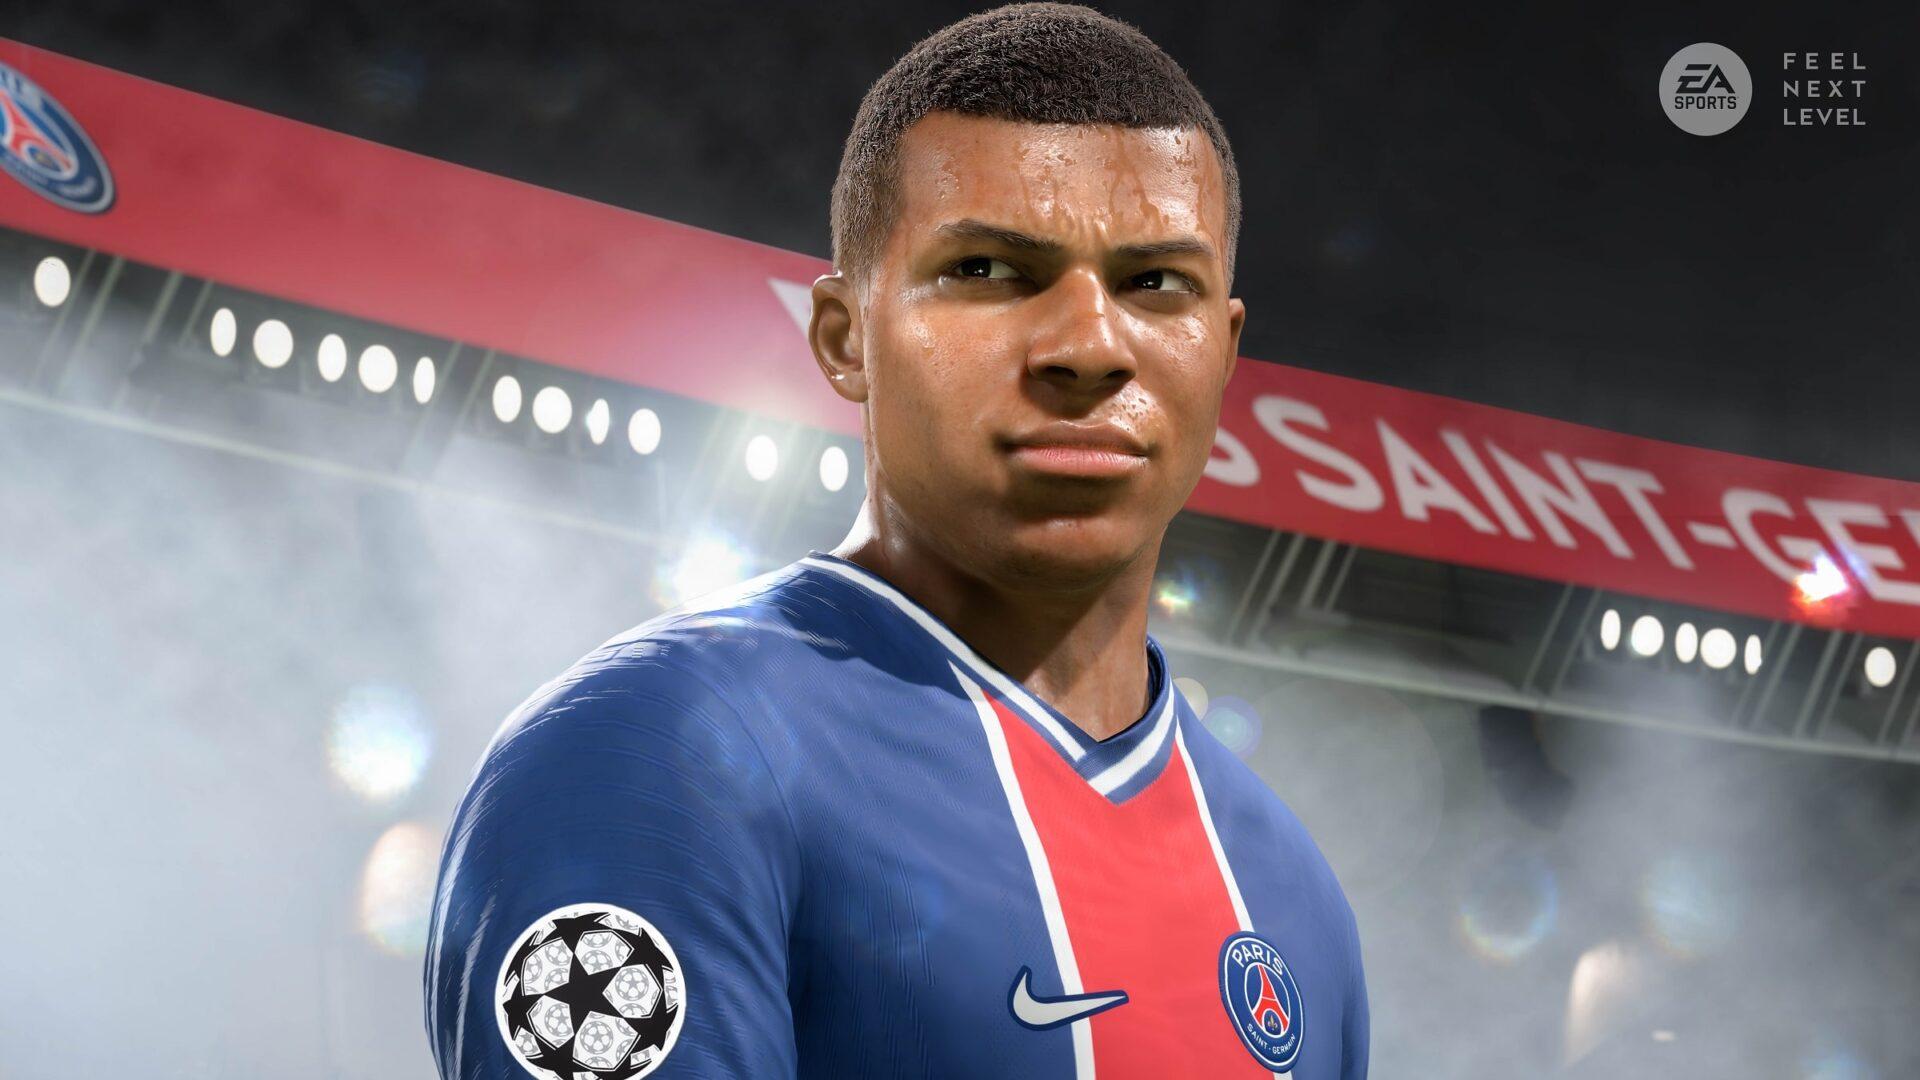 FIFA 22 Squad Battles rewards times